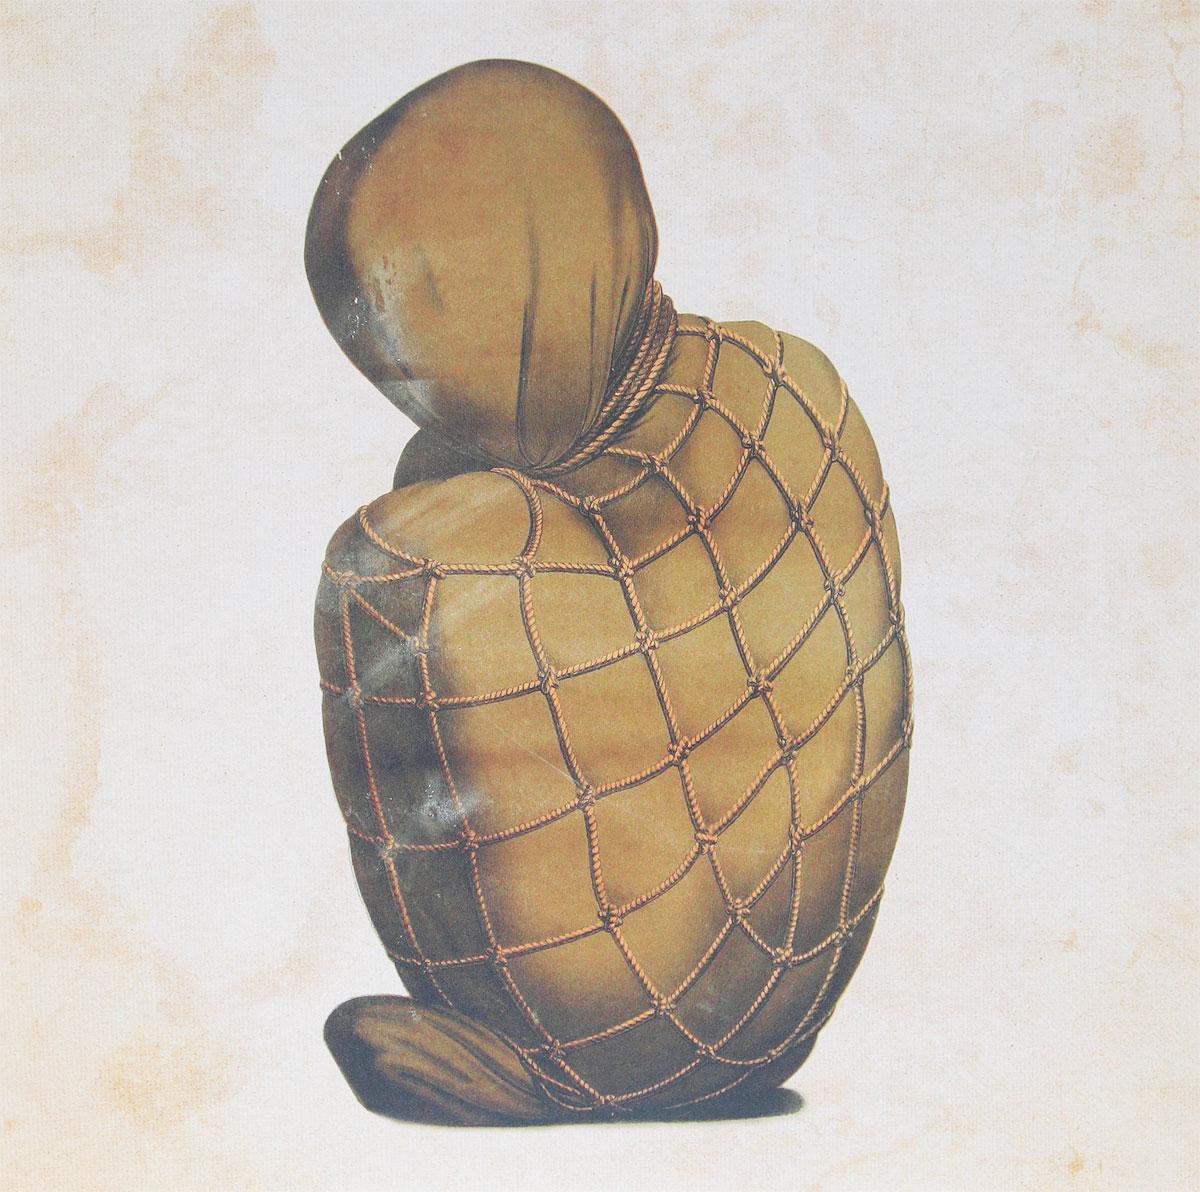 Kaada/Patton Kaada & Patton. Bacteria Cult (LP) mike patton chile